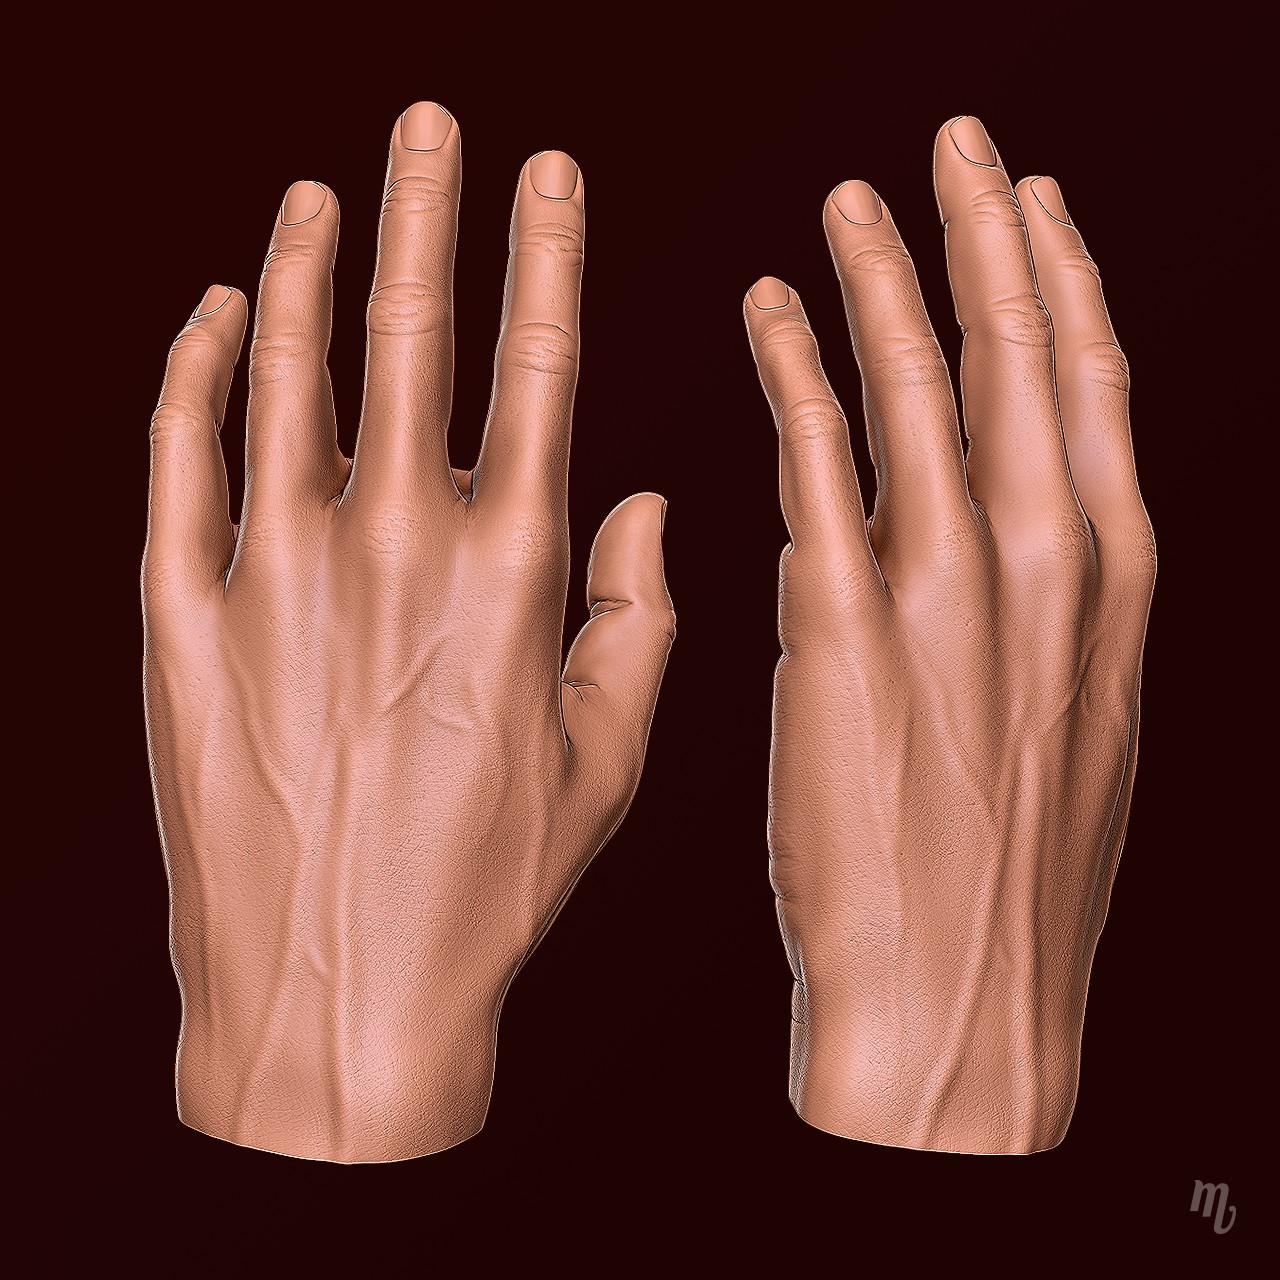 Marc virgili hand 09